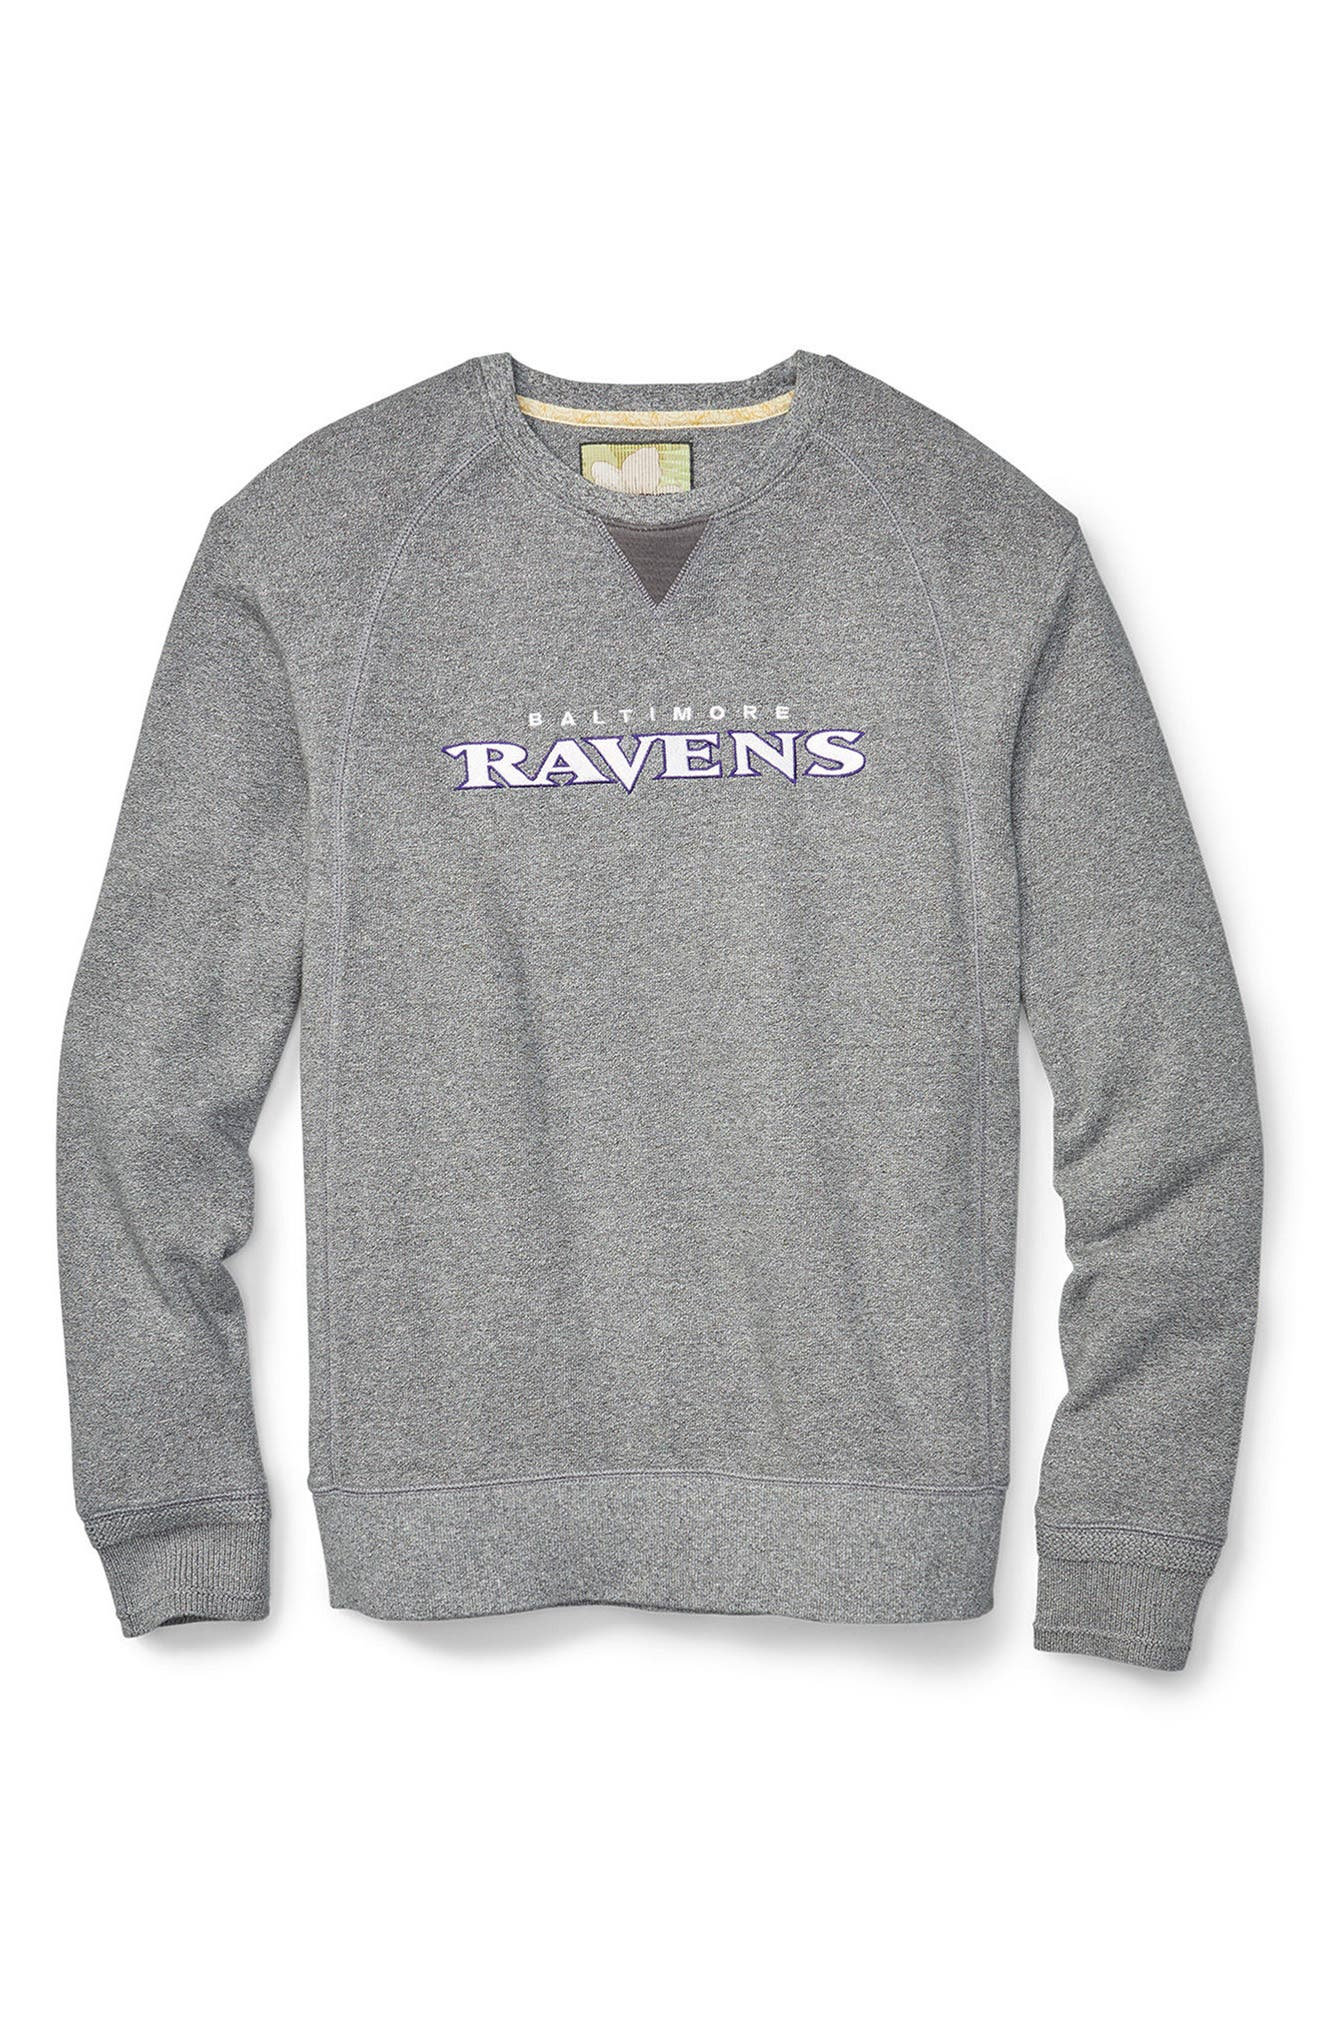 NFL Stitch of Liberty Embroidered Crewneck Sweatshirt,                             Main thumbnail 25, color,